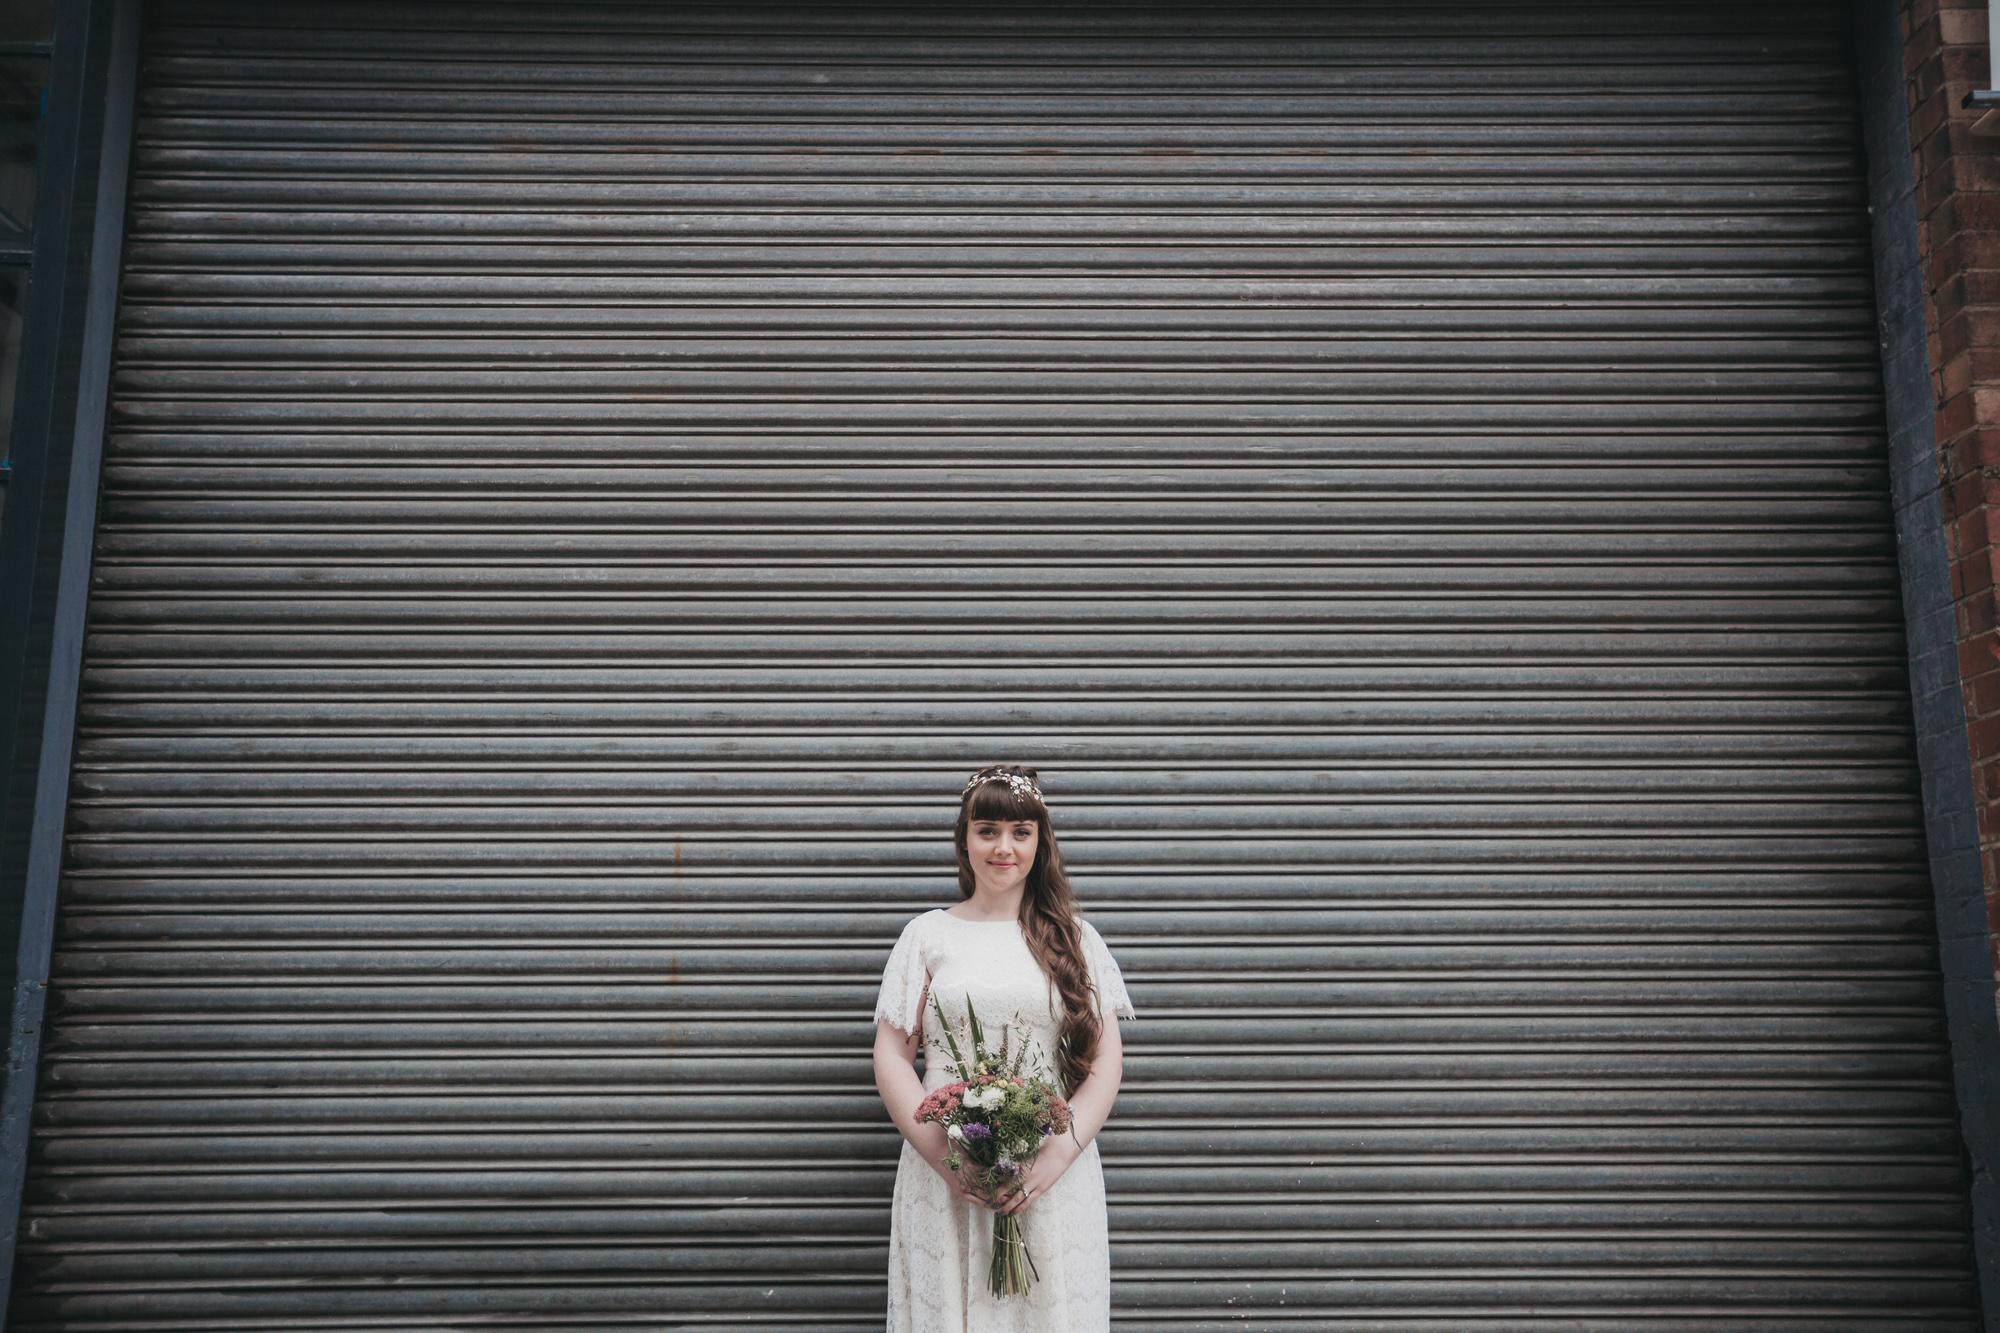 Kristy-Back-Garden-Outdoor-Wedding-Sheffield-Industrial-Warehouse-Wedding-Bohemian-Kate-Beaumont-Dahlia-Dress-35.jpg